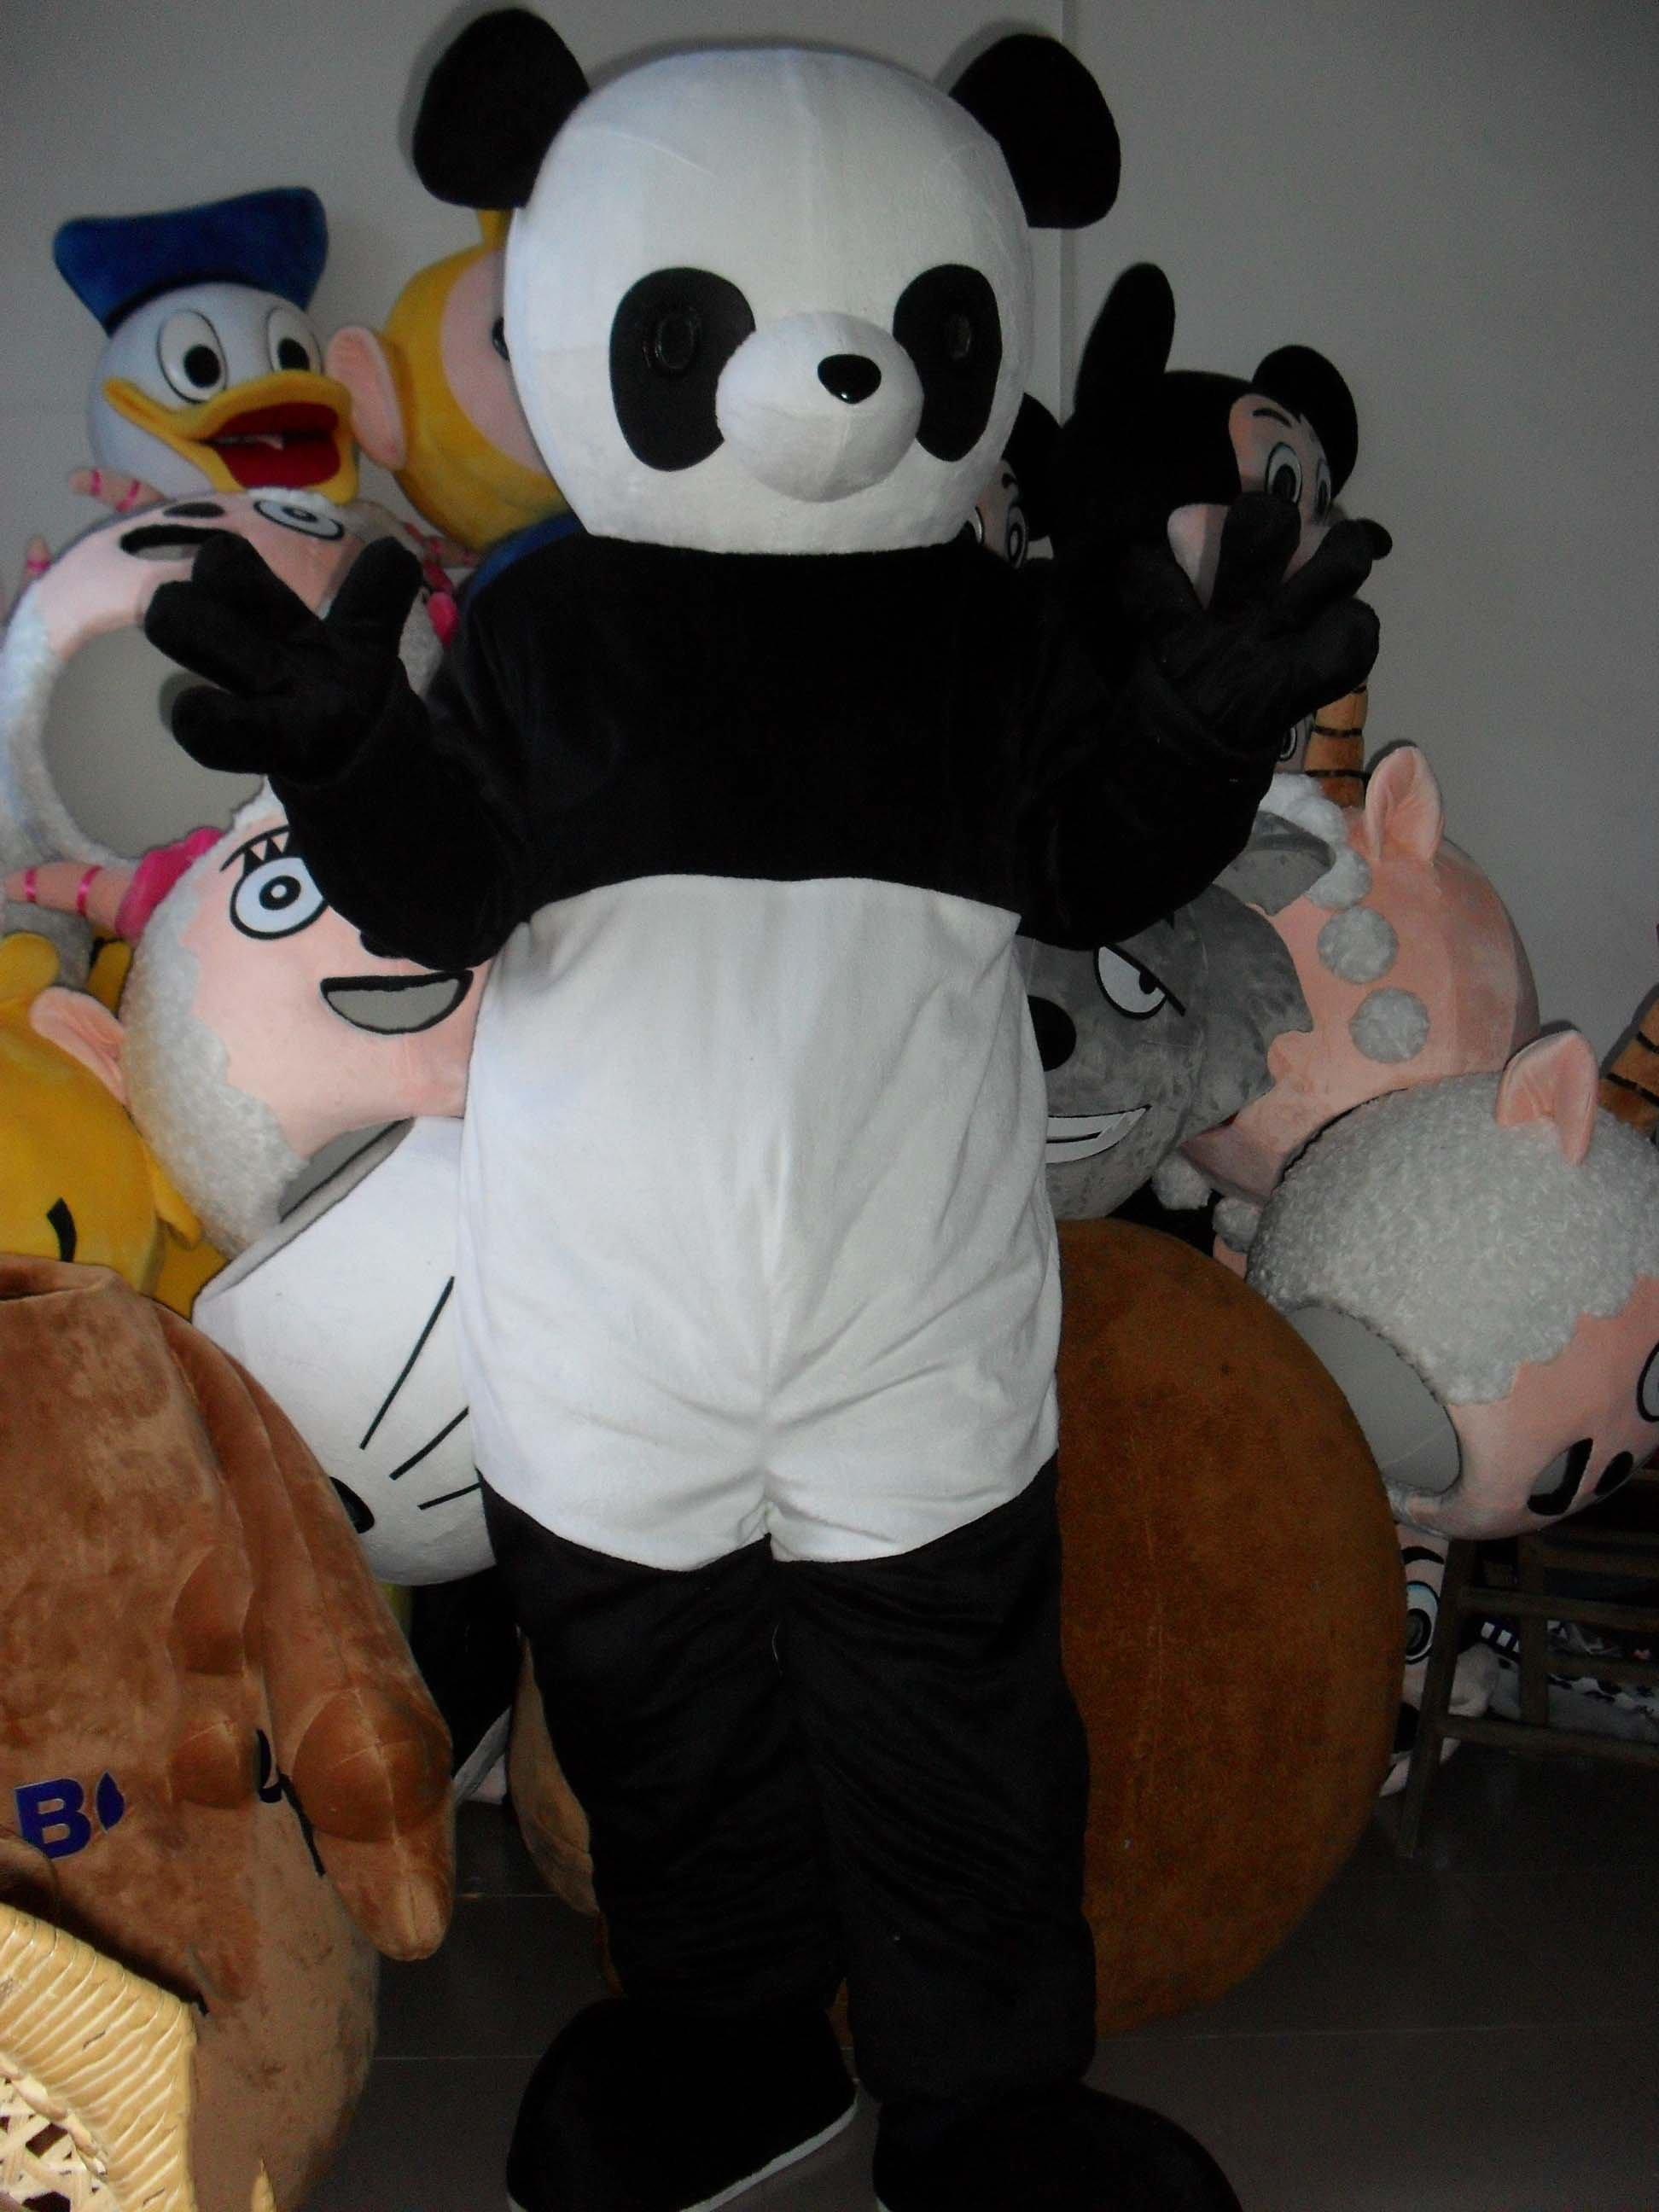 Baby Bear Cartoon Doll Clothing Cartoon Walking Doll Clothing Cartoon Show Clothing Clothing Panda Dolls Mascot Costume